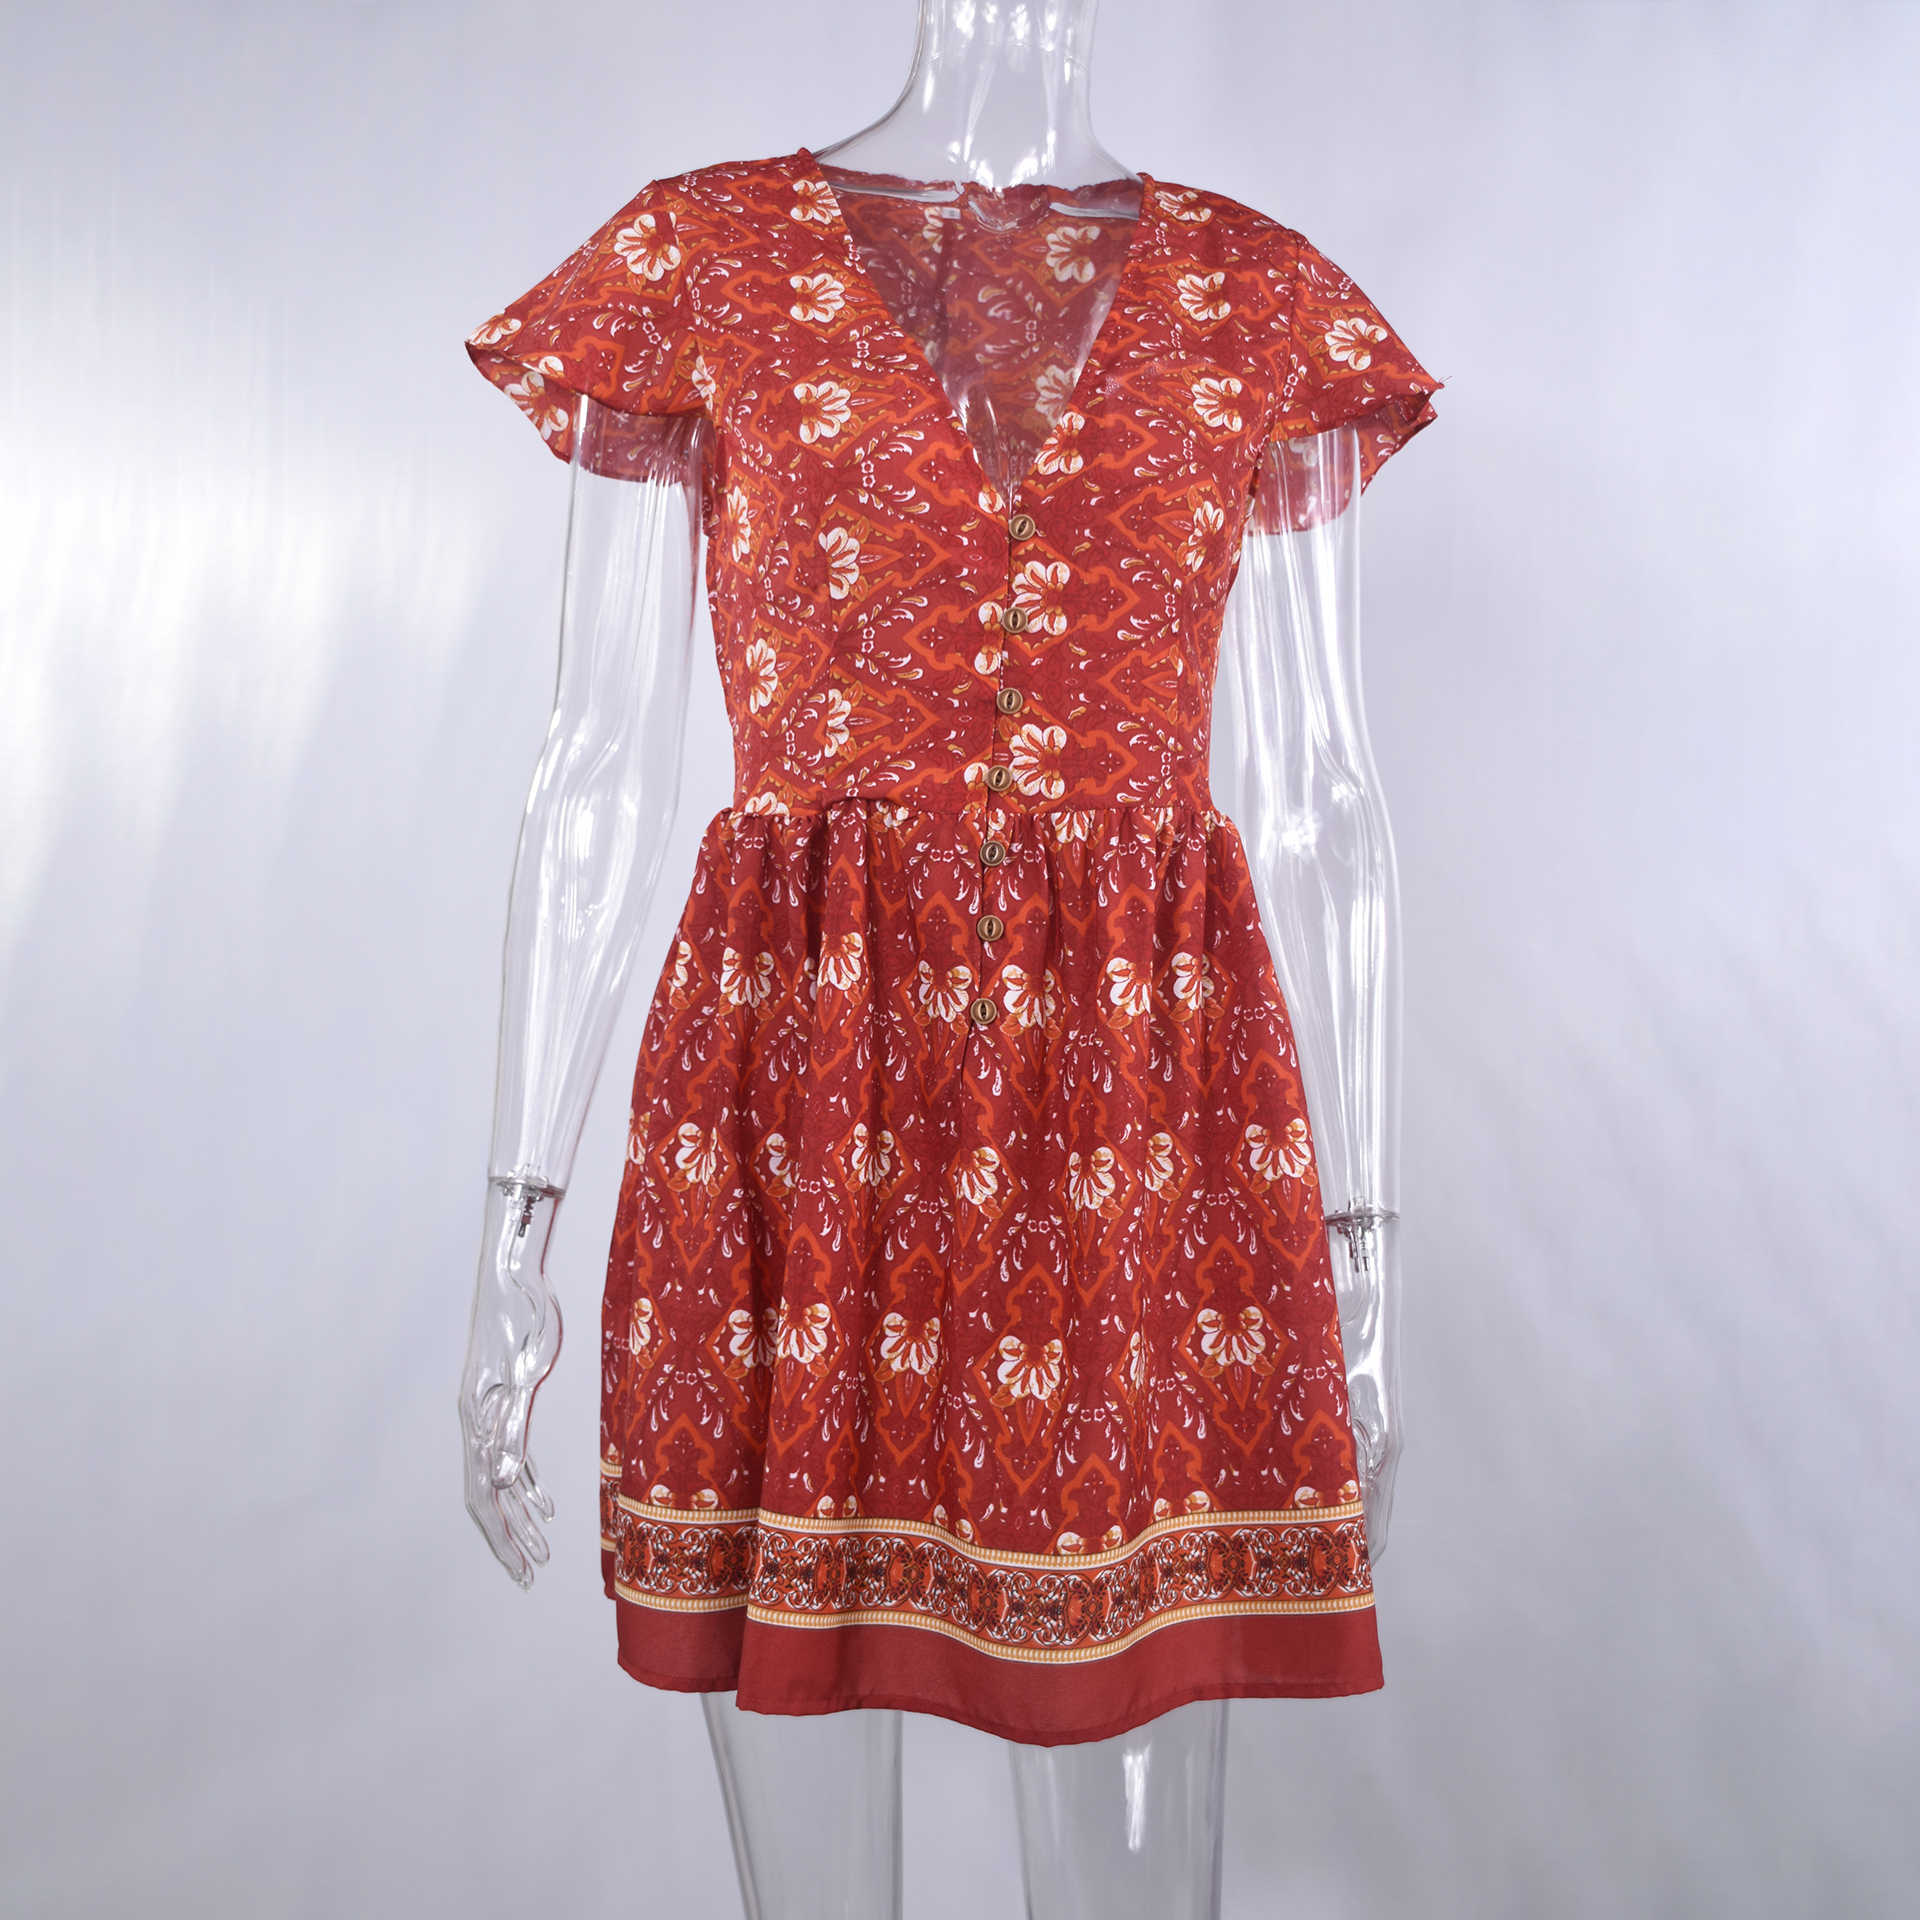 Gaun Wanita Gambar Bunga Kasual Musim Panas Pantai Pendek Mini Sundress Bohemian Pakaian Liburan 2020 Hitam Merah Gaun untuk Wanita